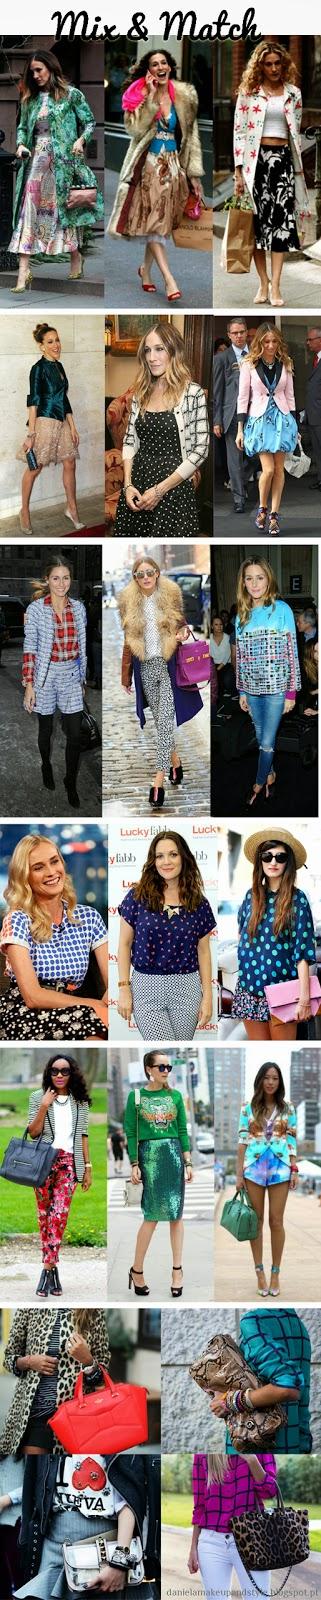 daniela pires, style tips, trend. tendencias, dicas de estilo, personal stylist, misturas, mix & match